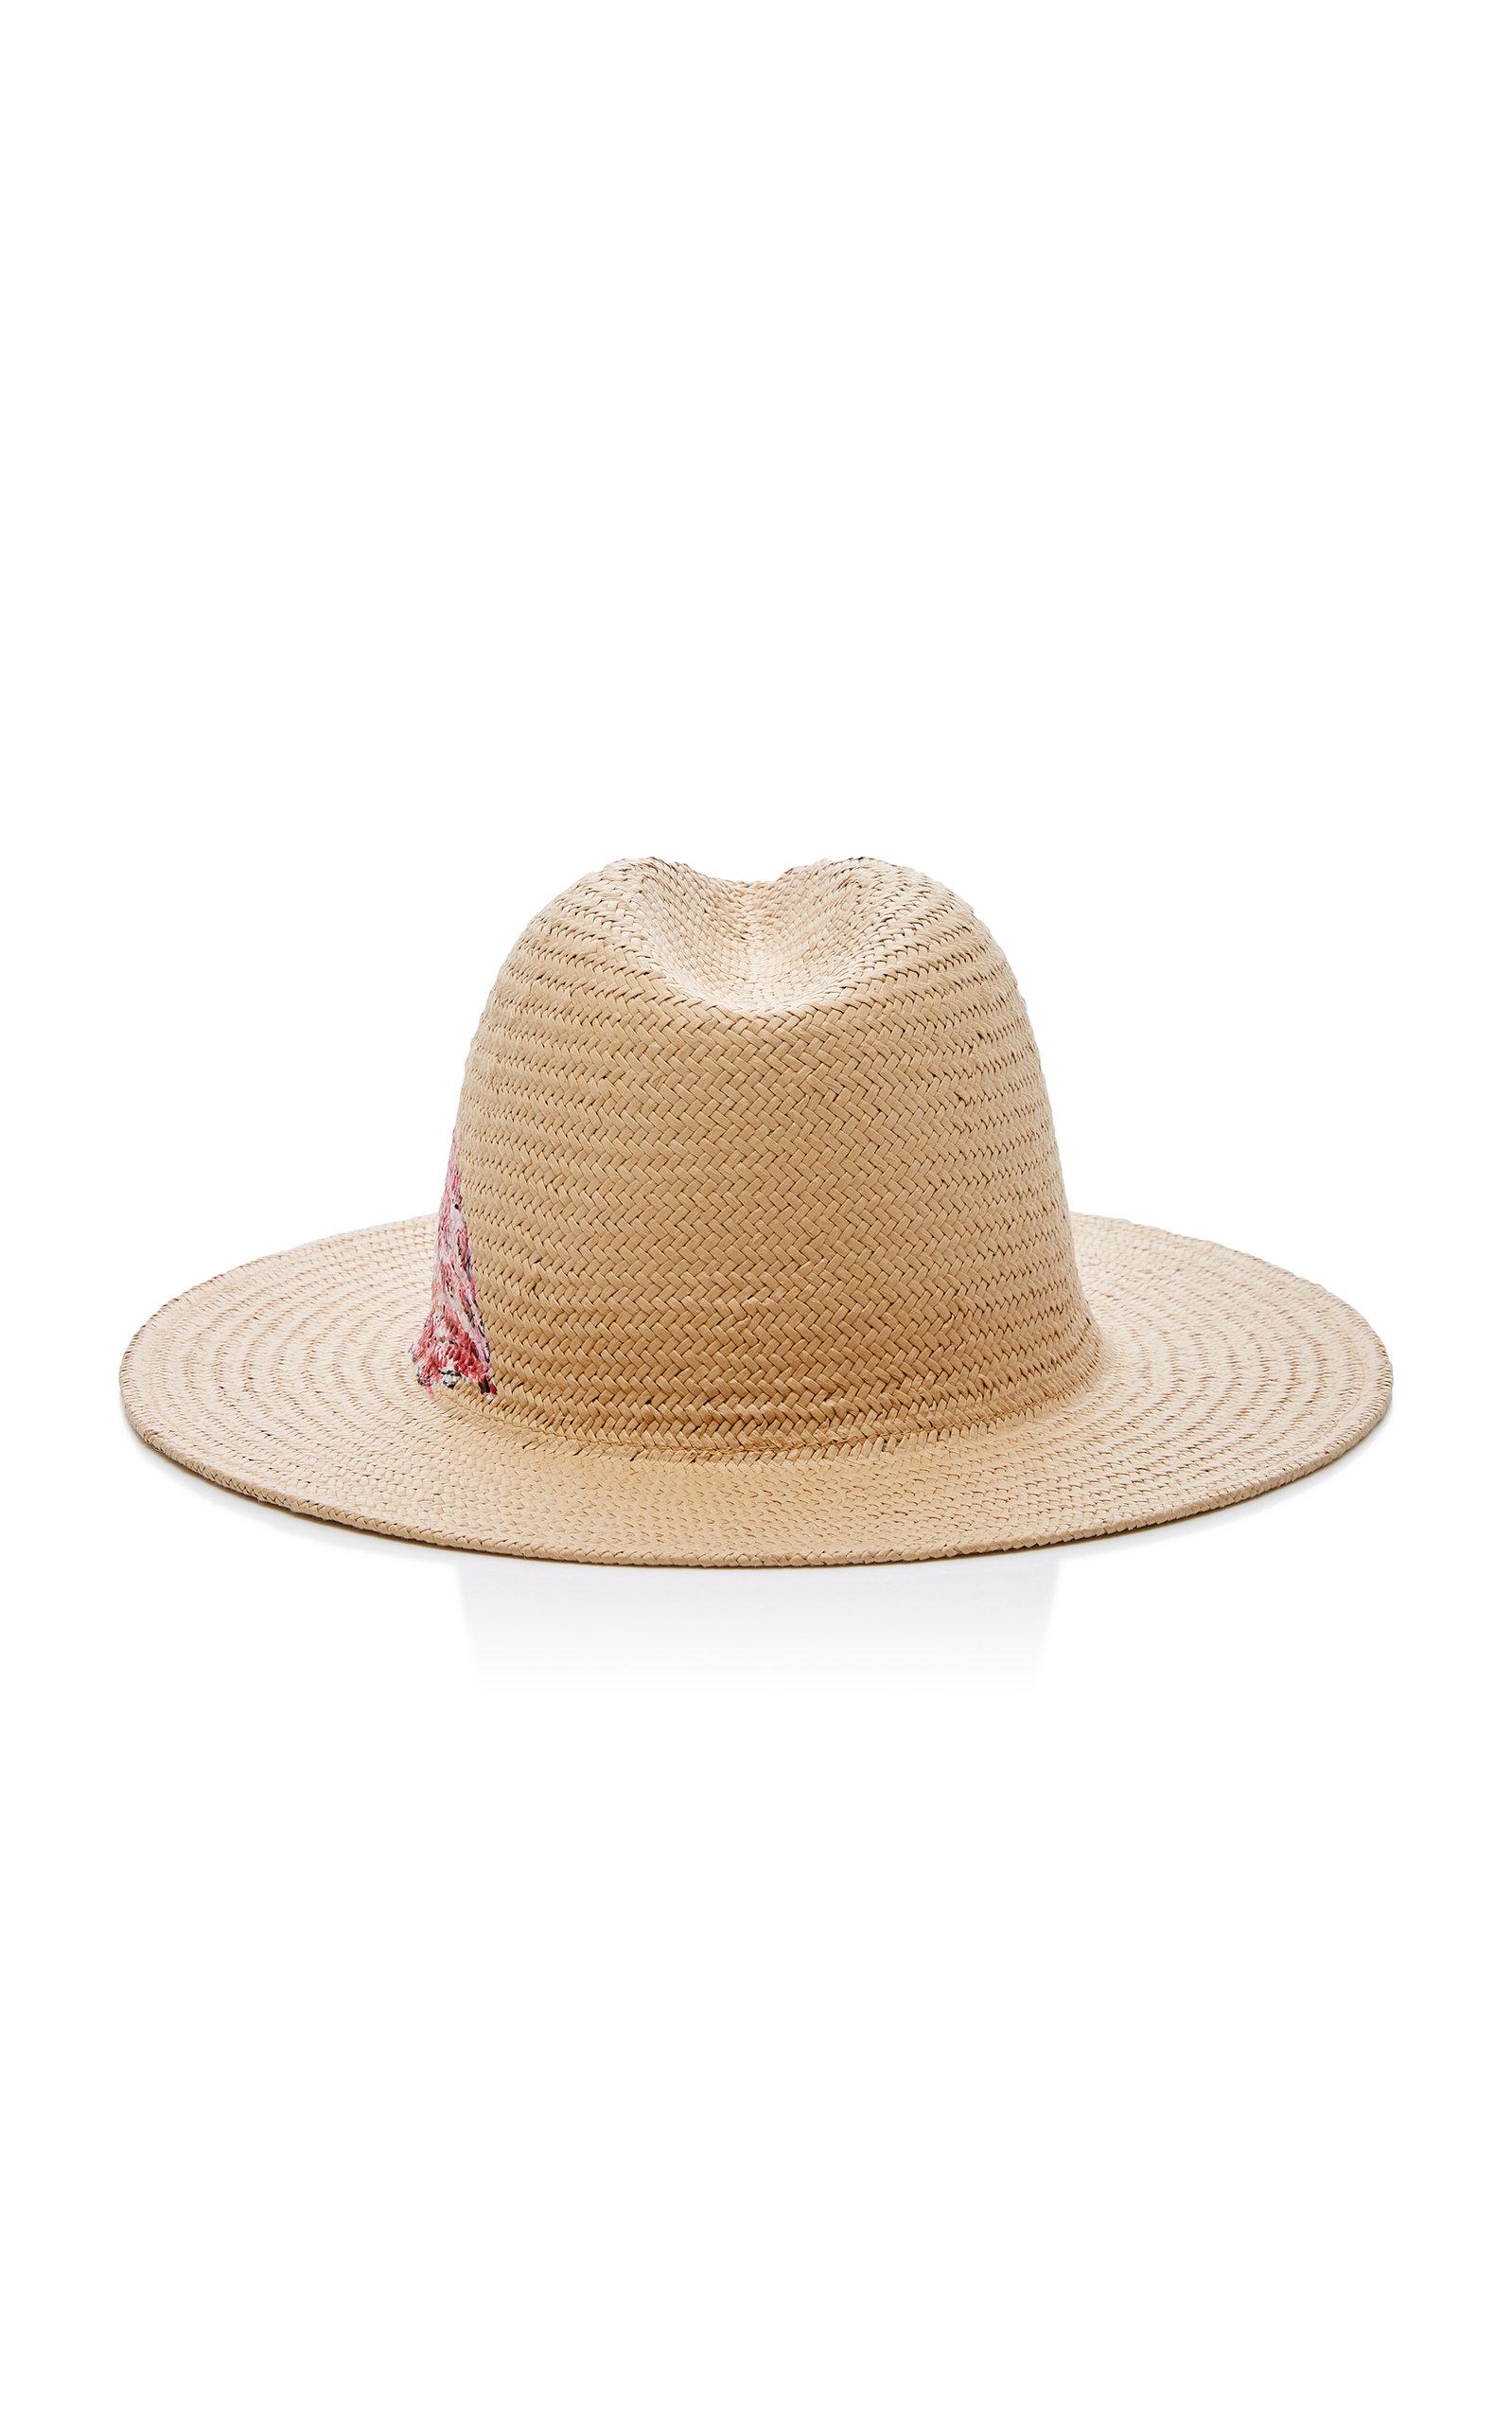 Rosa Panama Hat Onia 1mUtHCp1